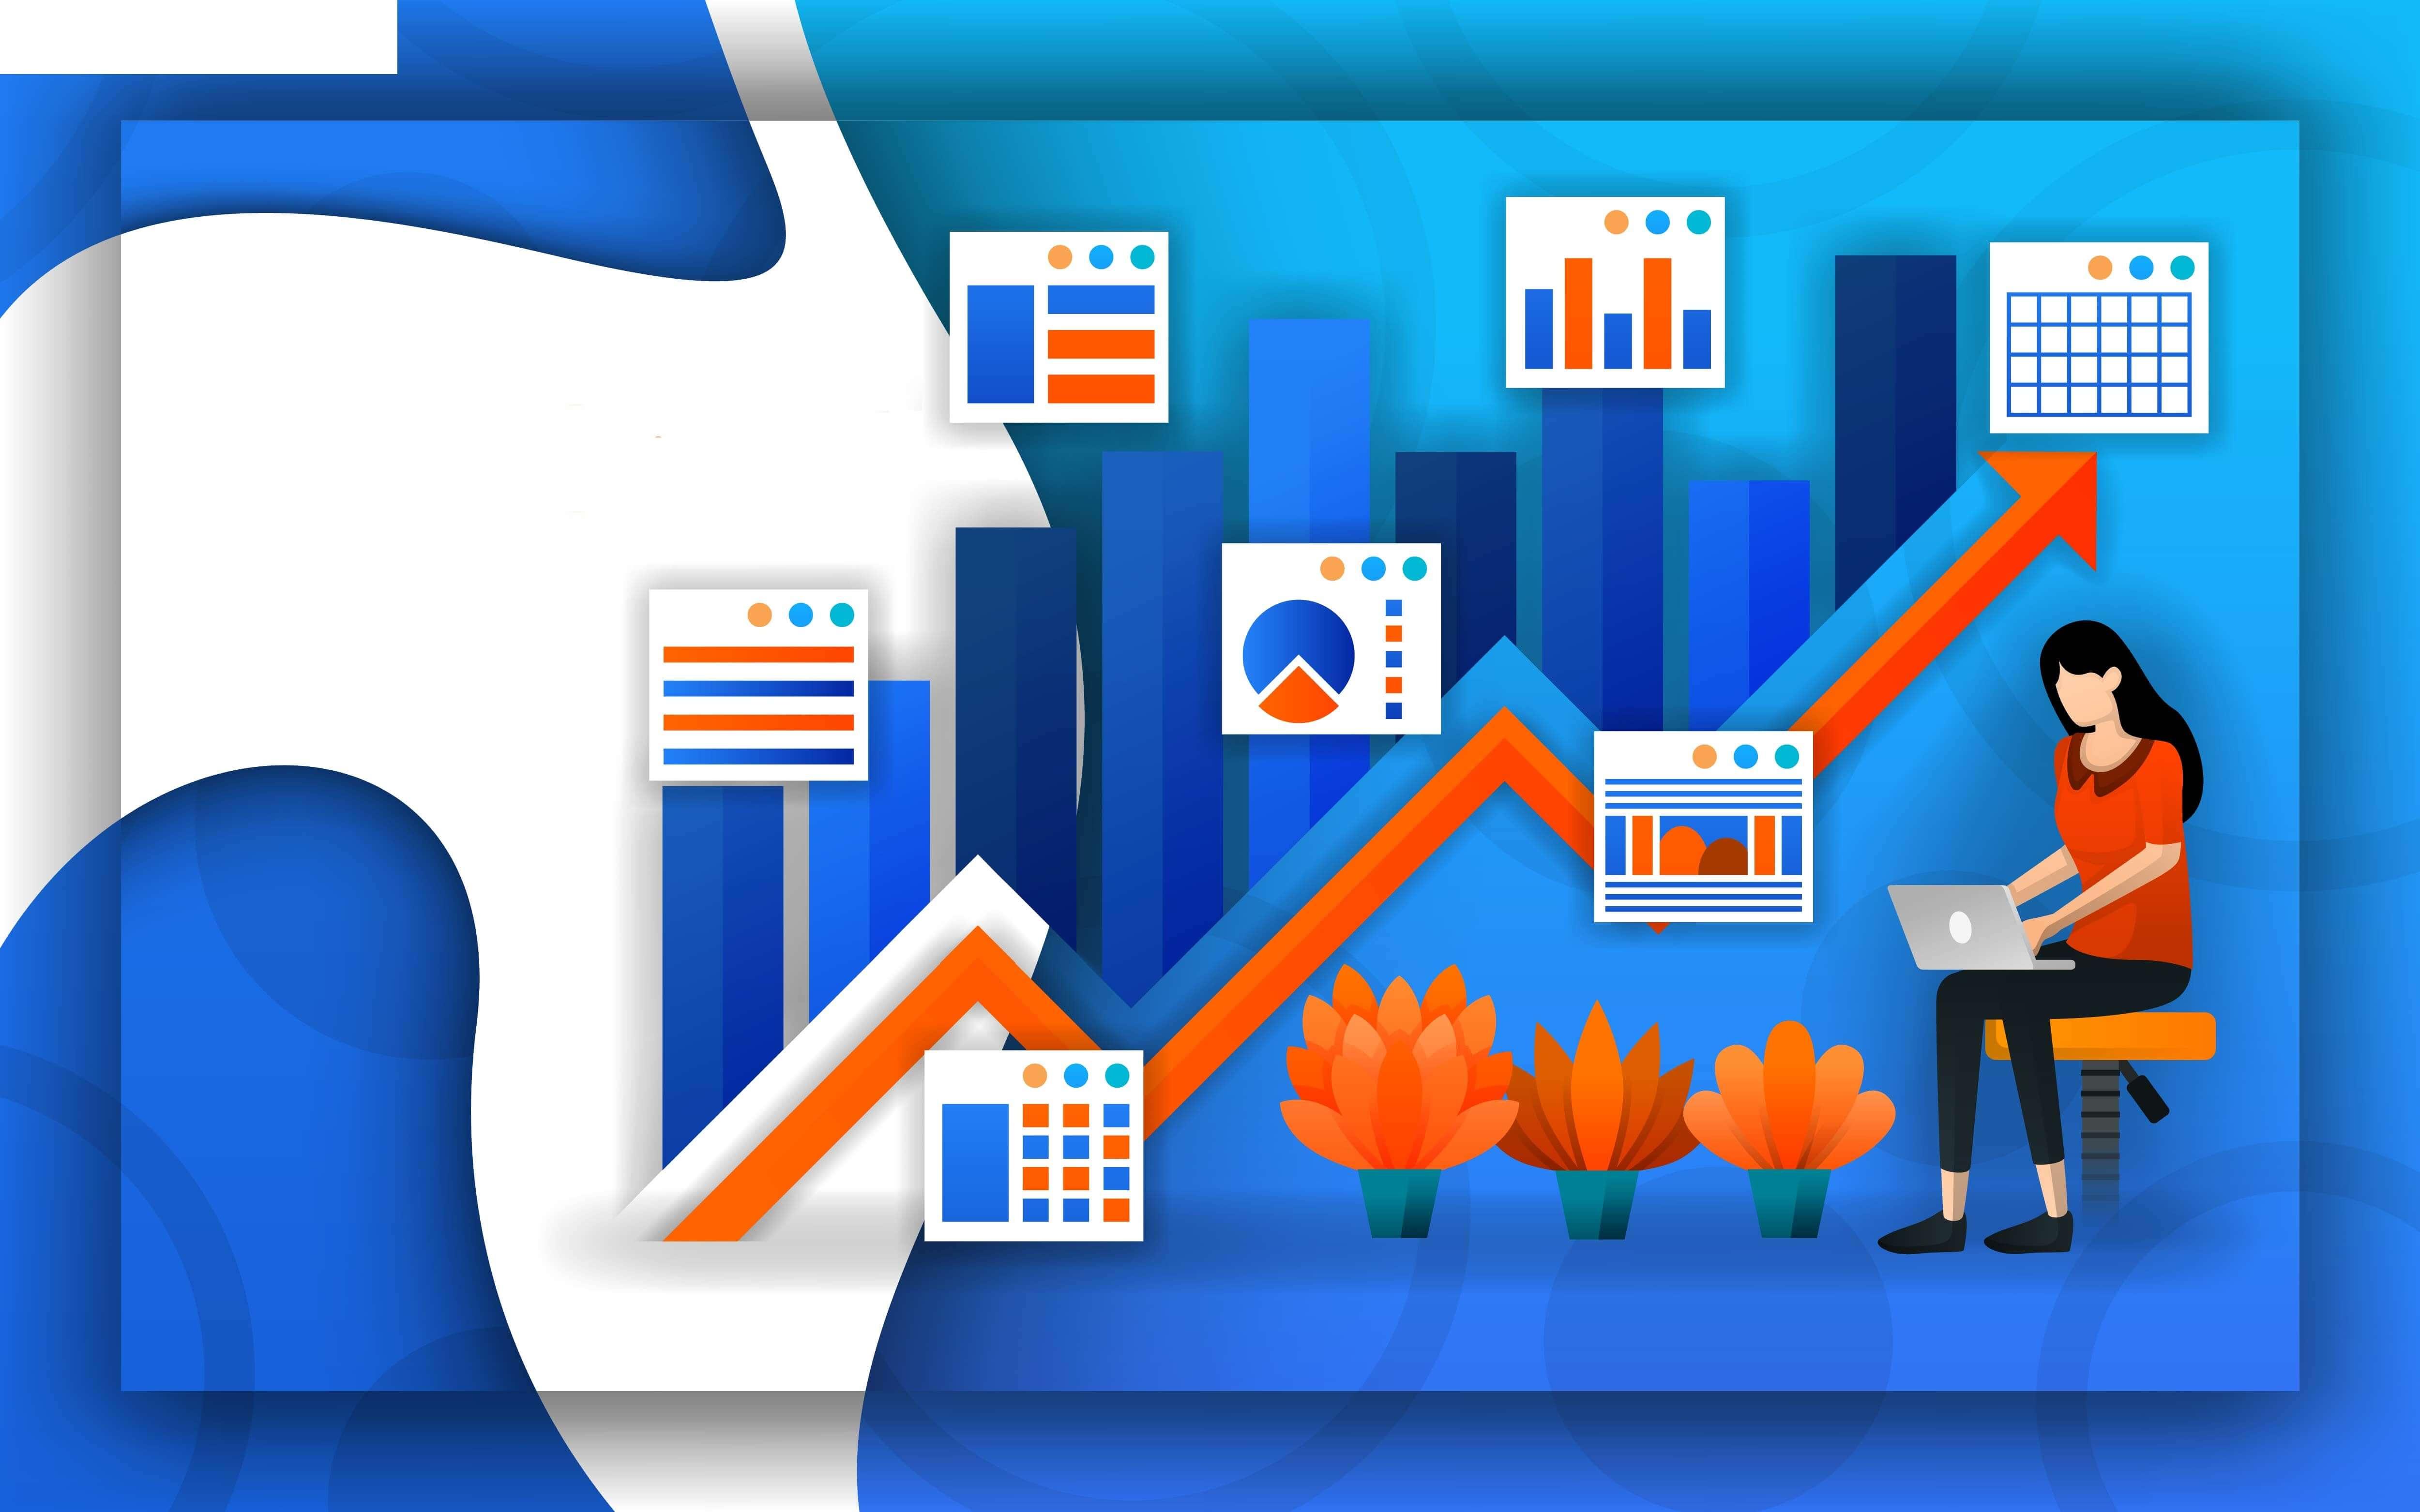 Negociación de índices: ¿Qué índices ofrece Exness?